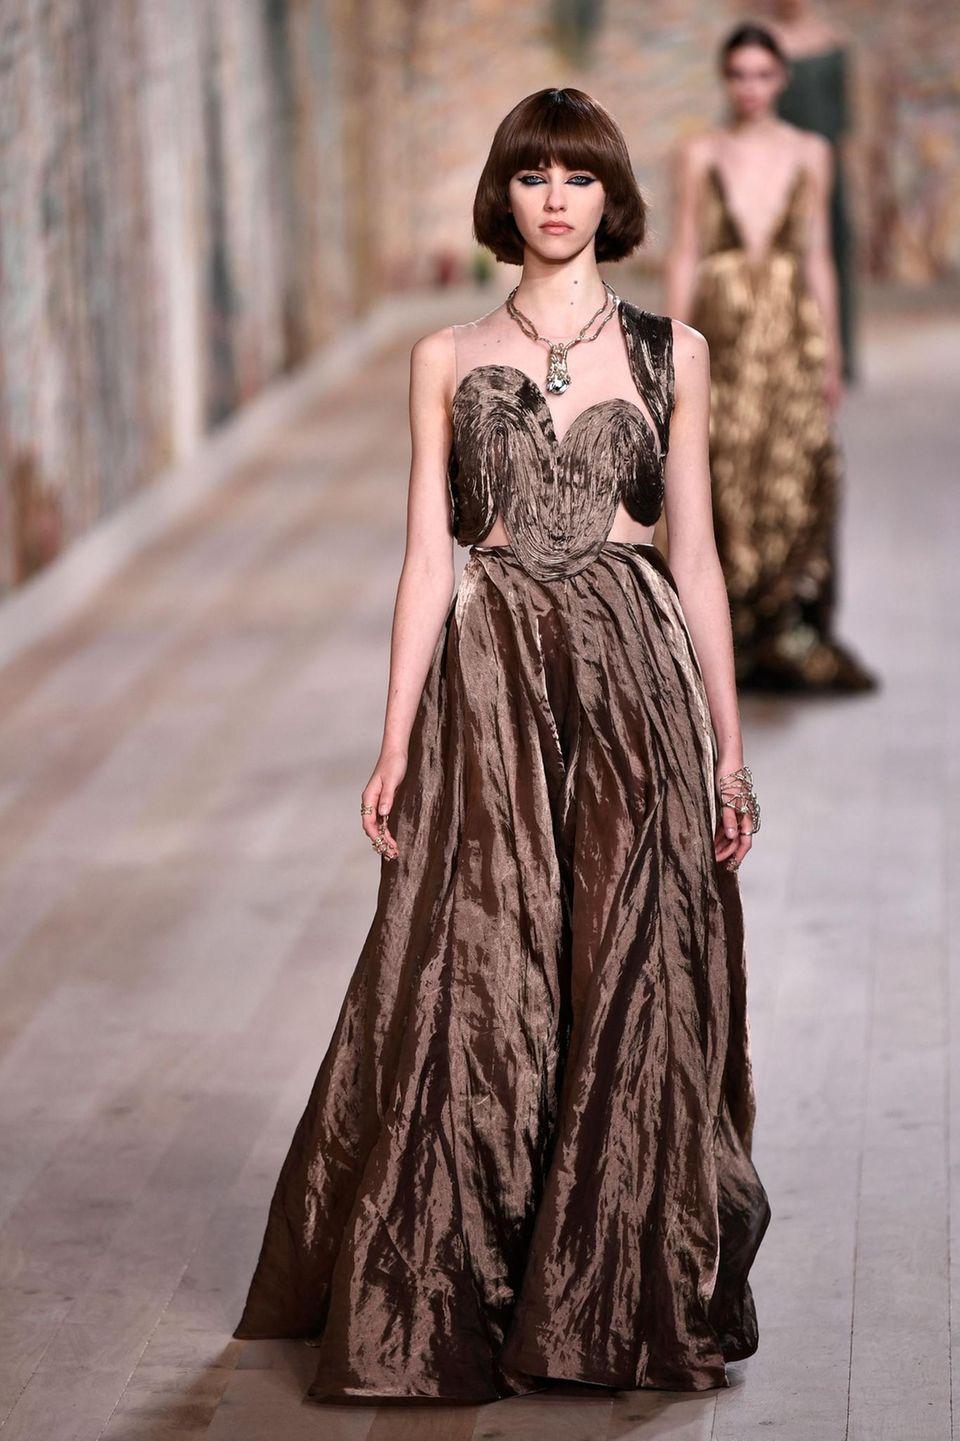 Christian Dior Haute Couture Show 2021/2022